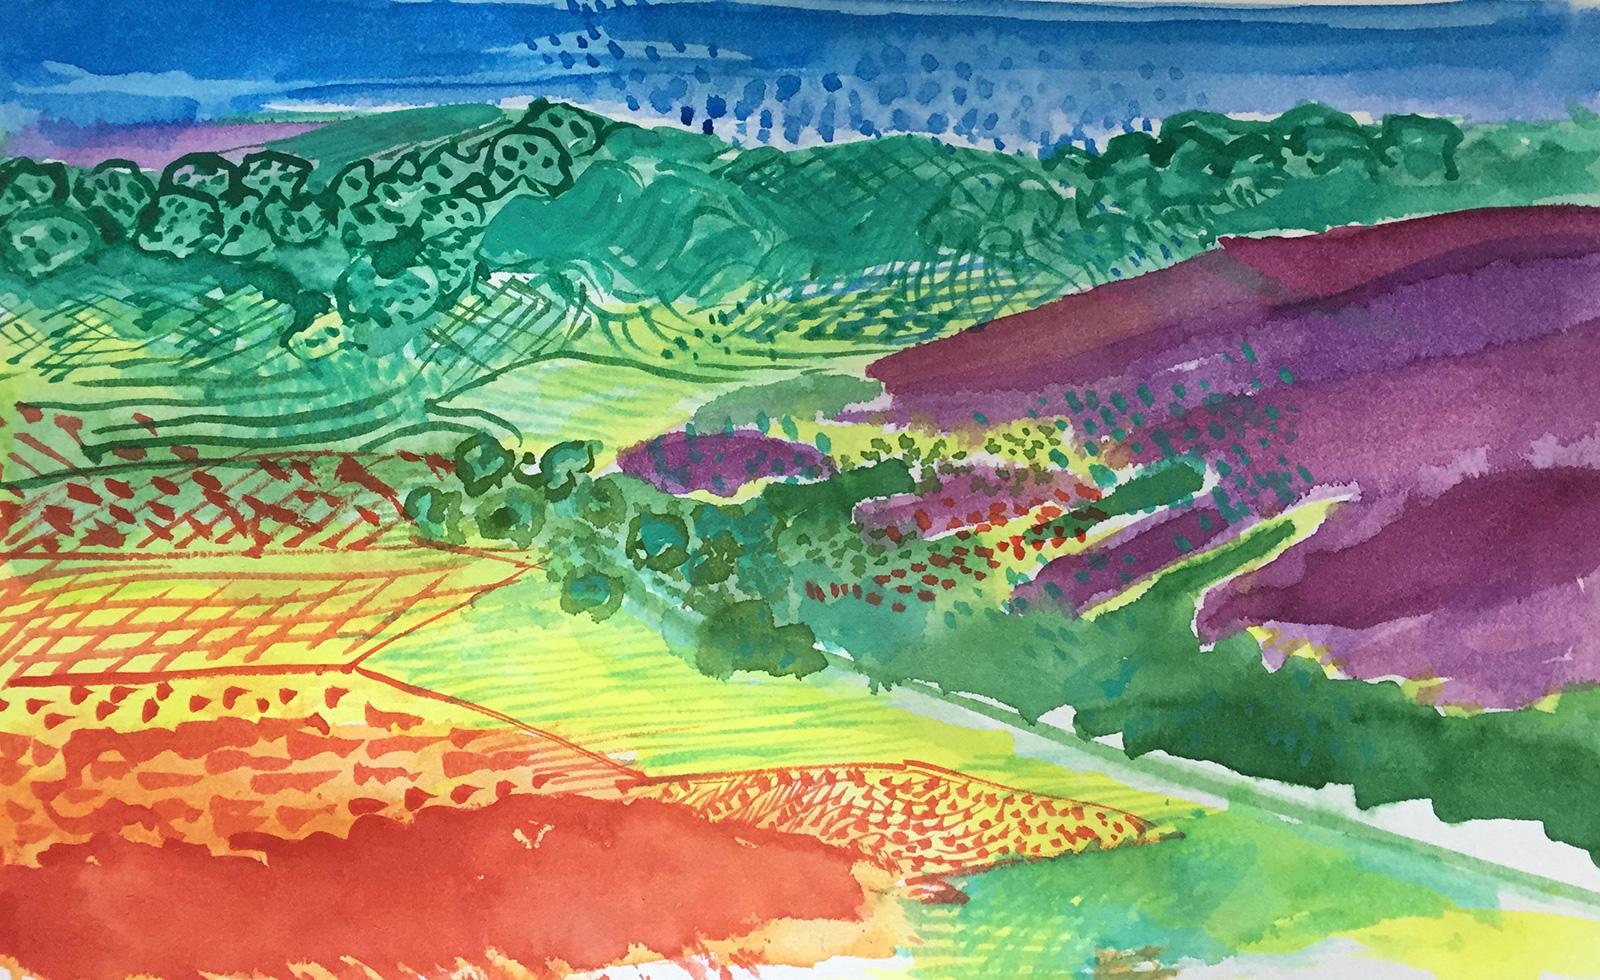 Harriet Brigdale - student's work, Wendy Leach